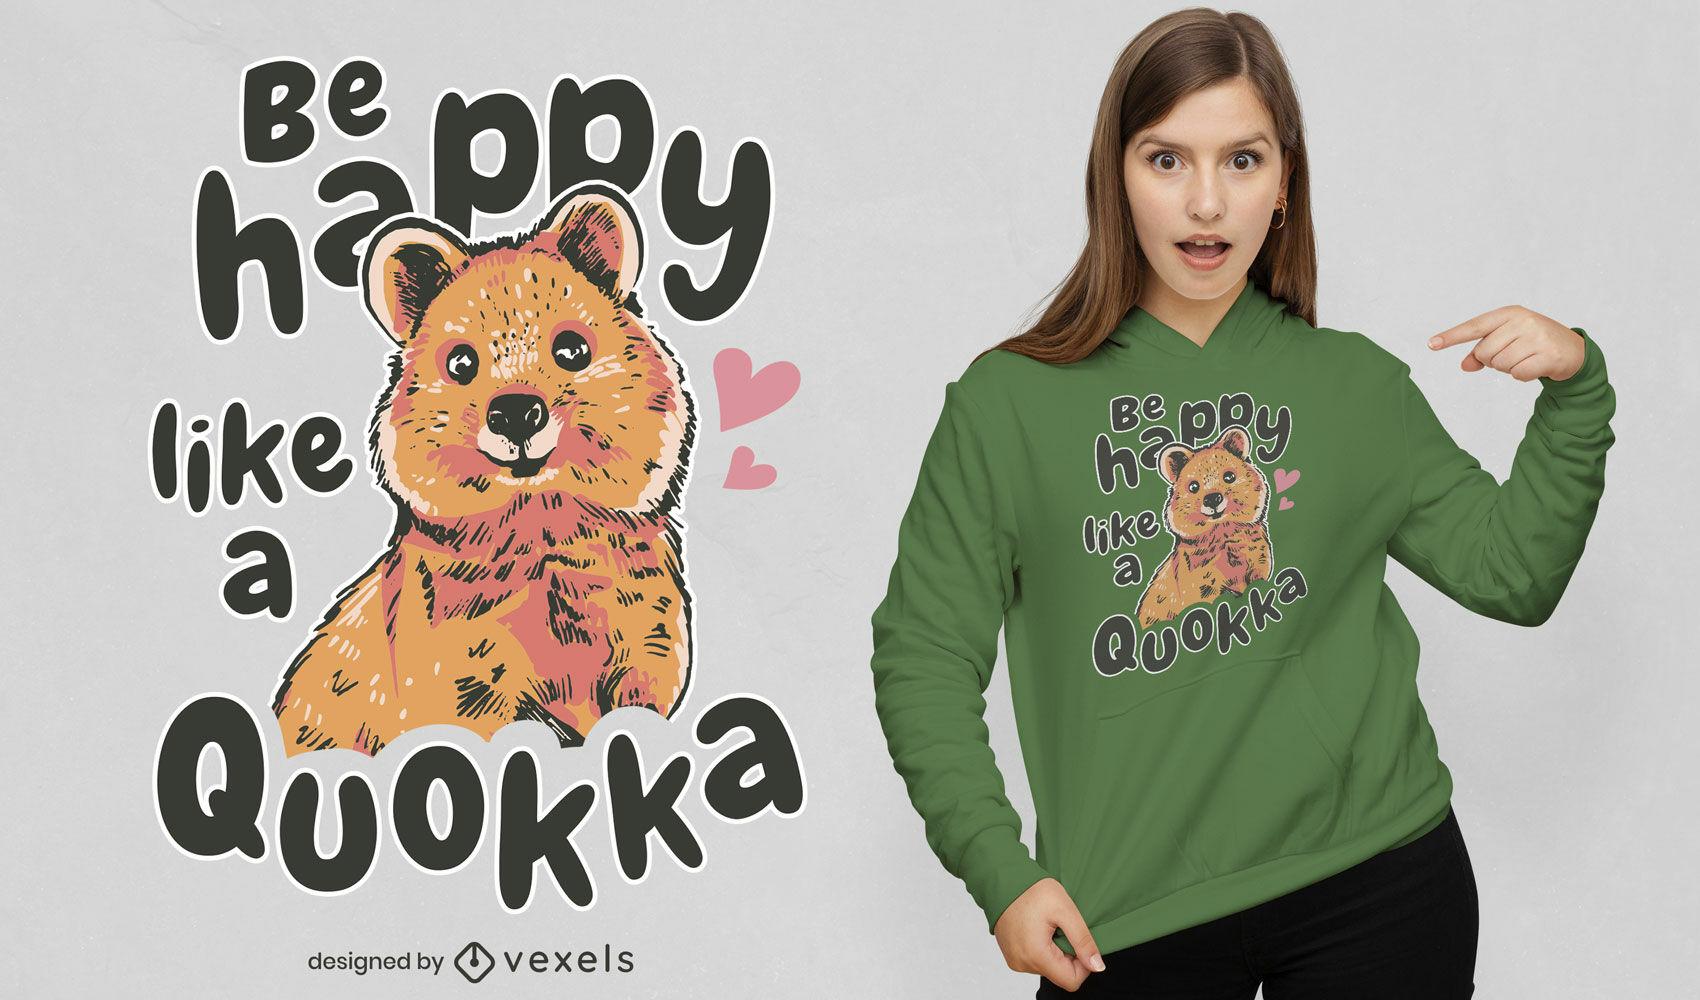 Süßes fröhliches Quokka-T-Shirt-Design